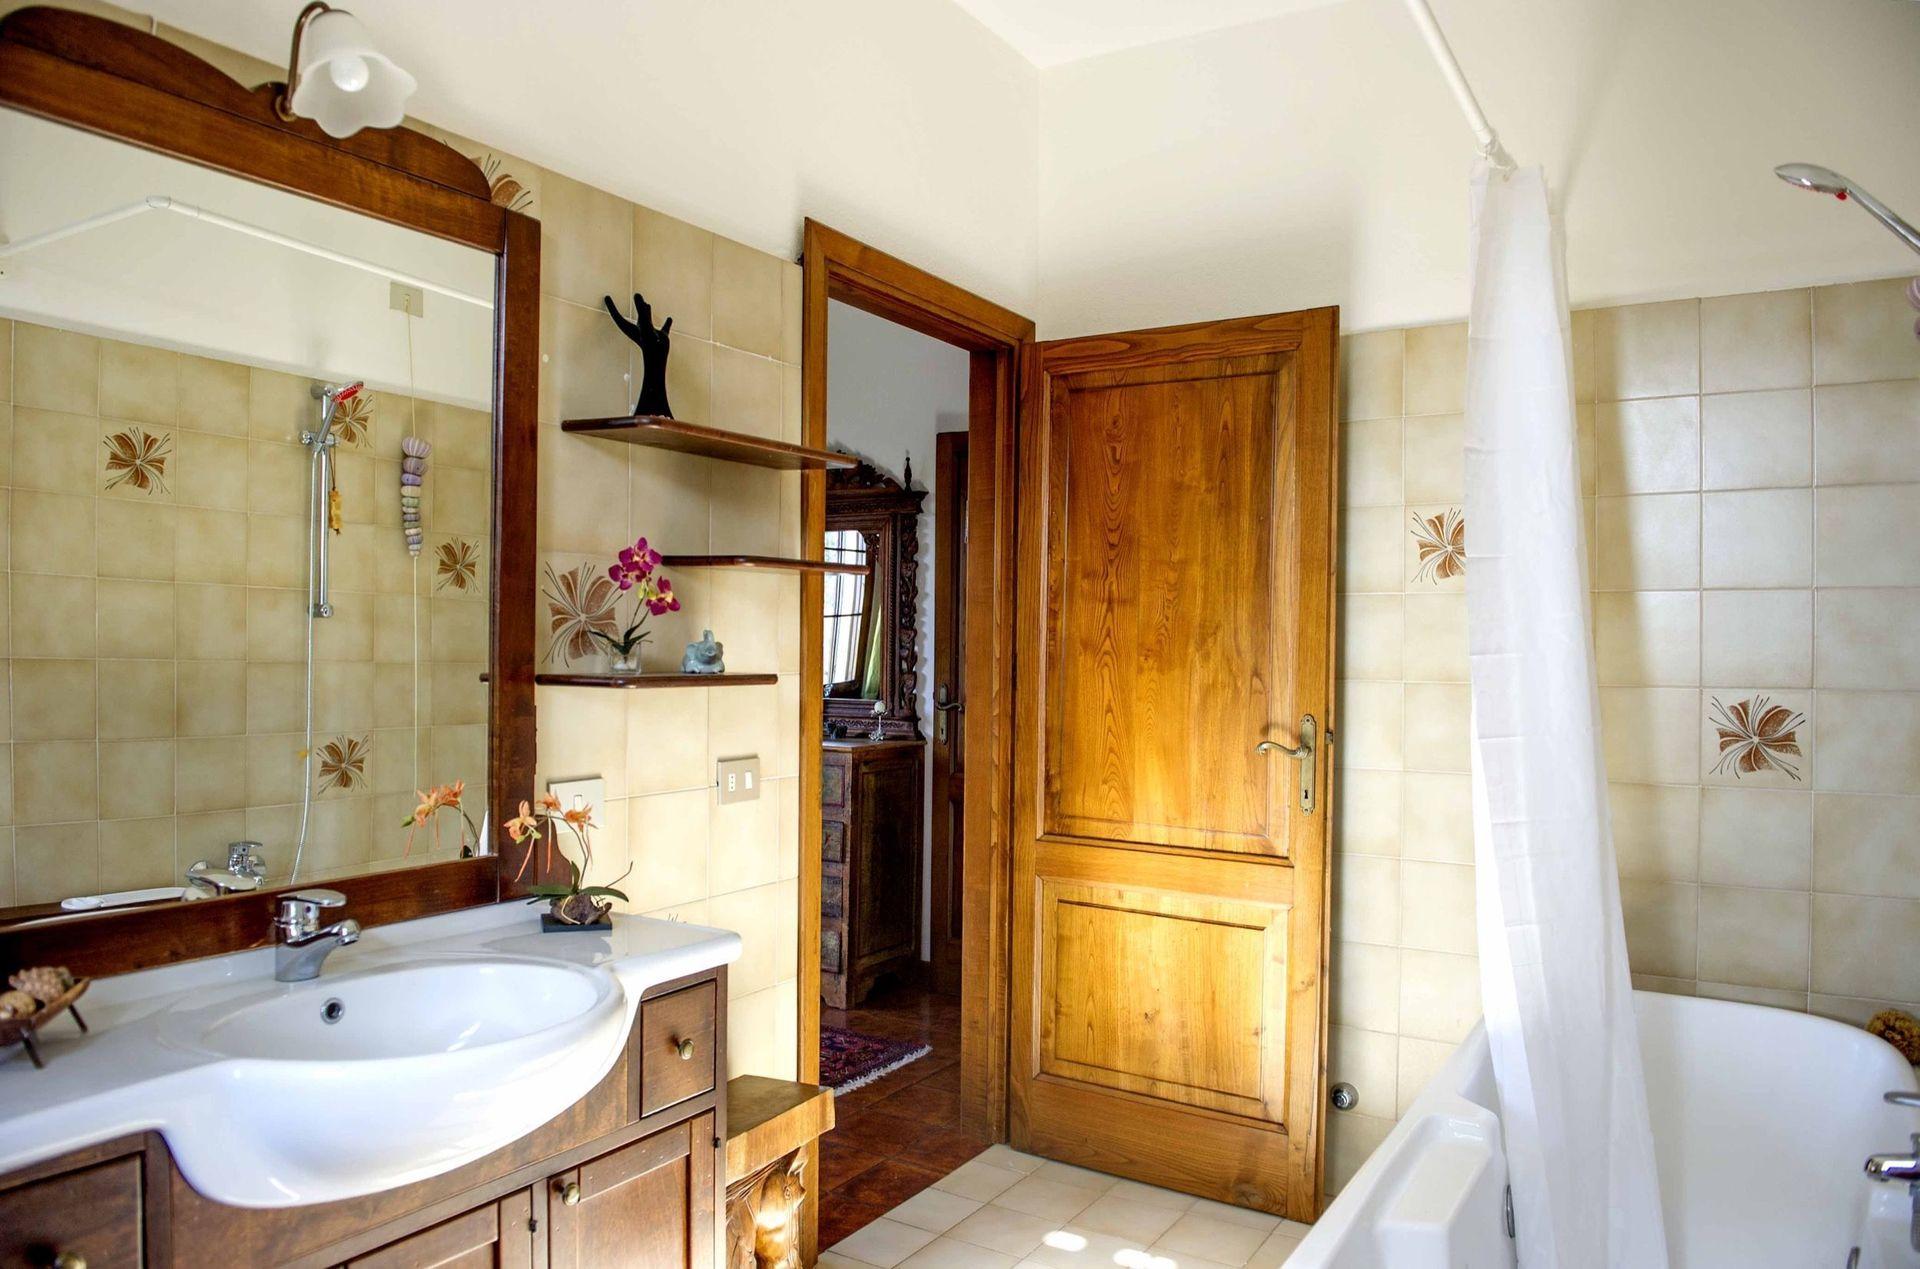 Villa Porta a Colle - Ferienhäuser Toskana für Personen mit ...